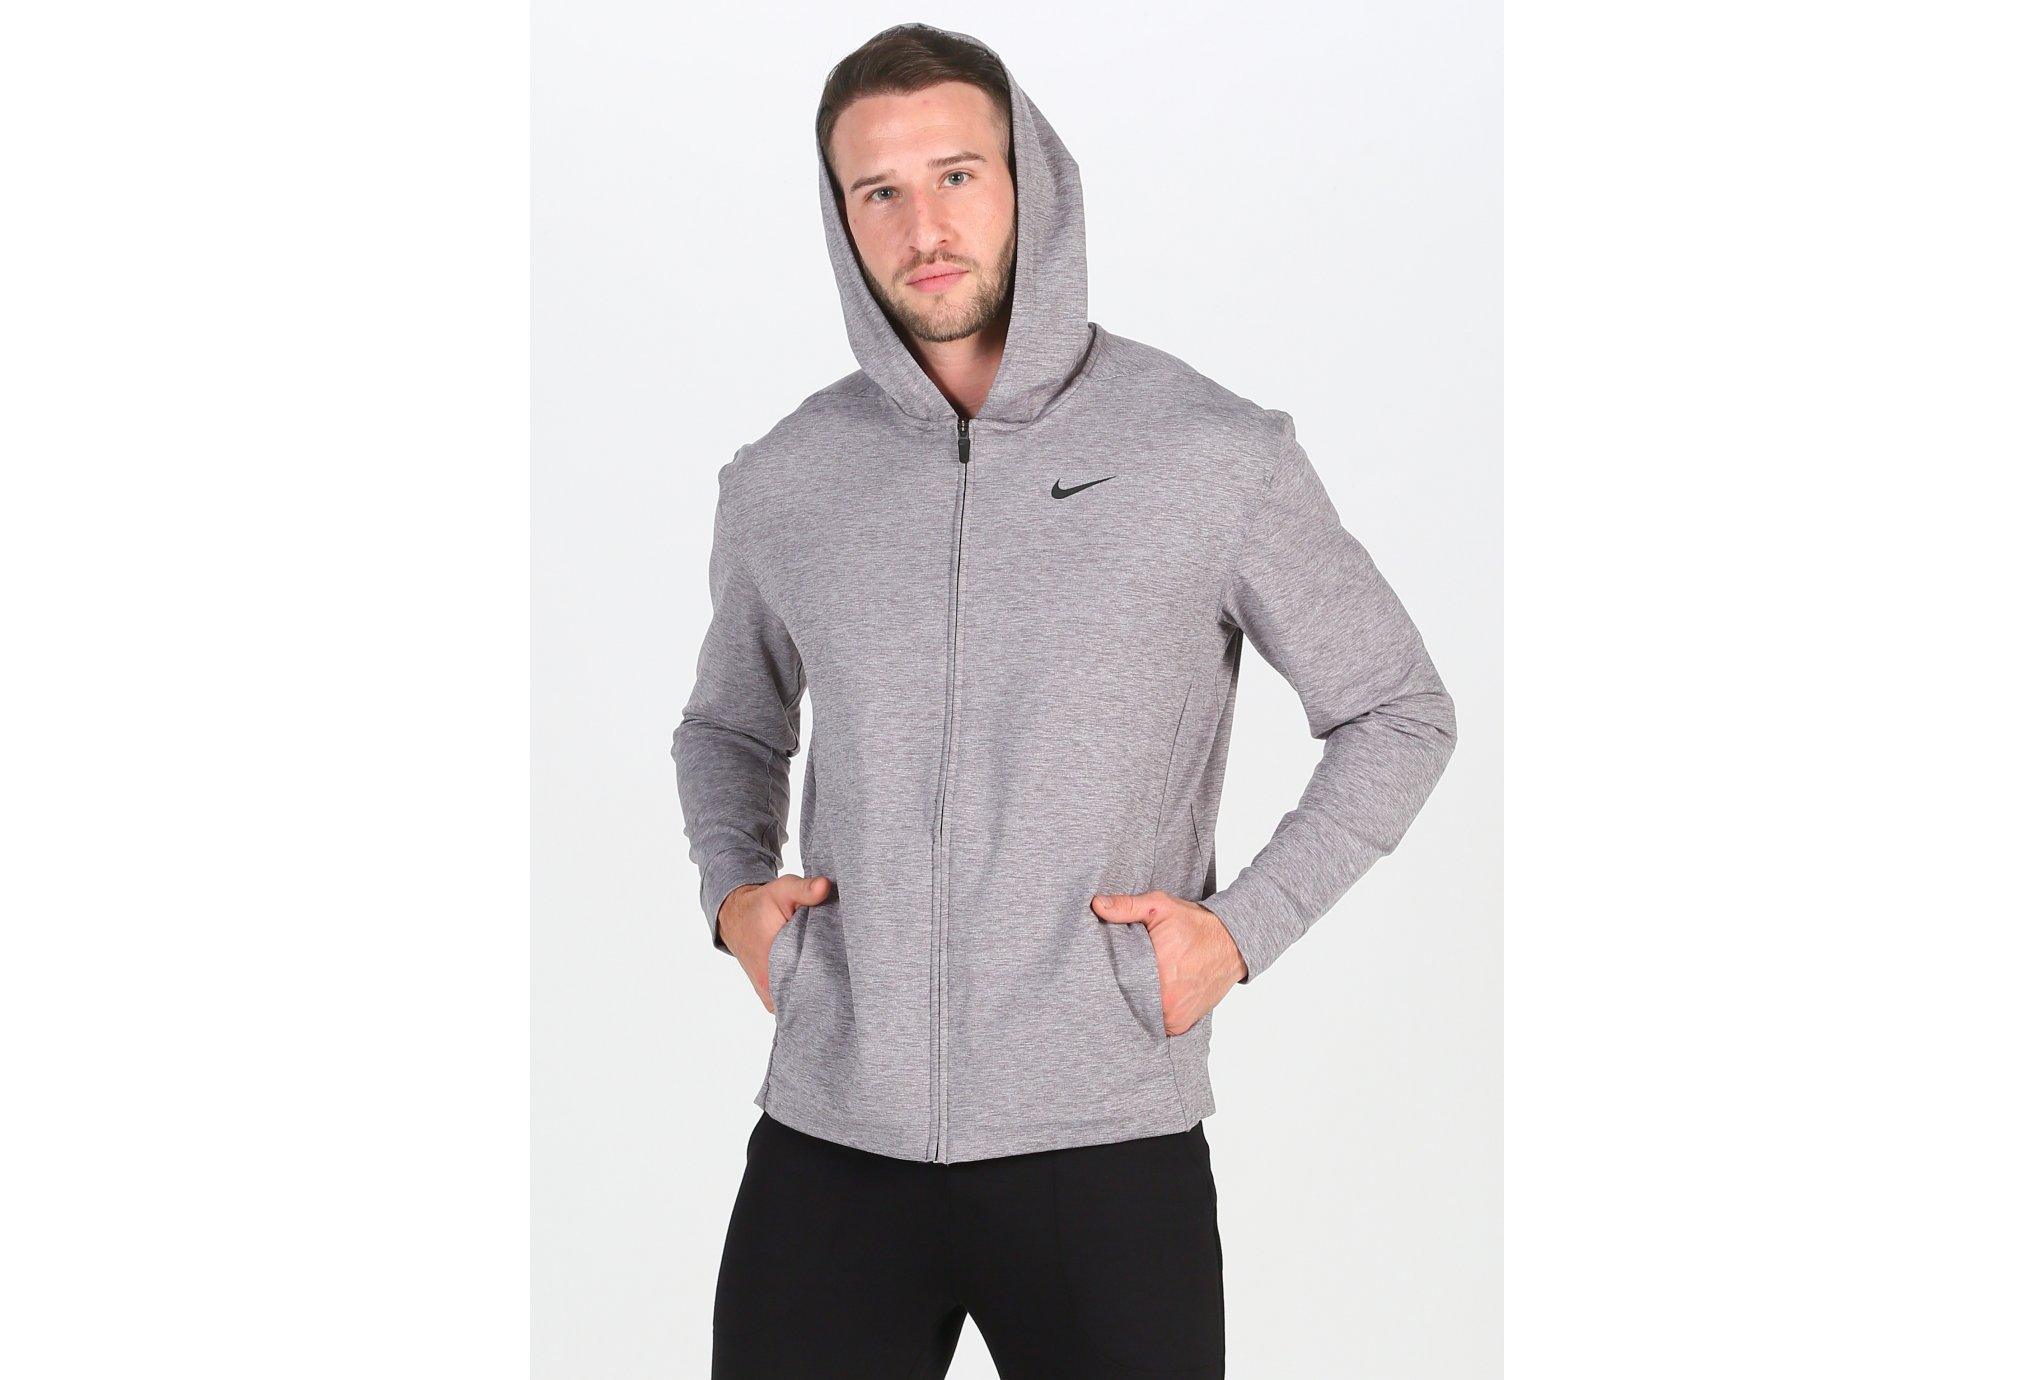 Nike Hyperdry Yoga M Diététique Vêtements homme